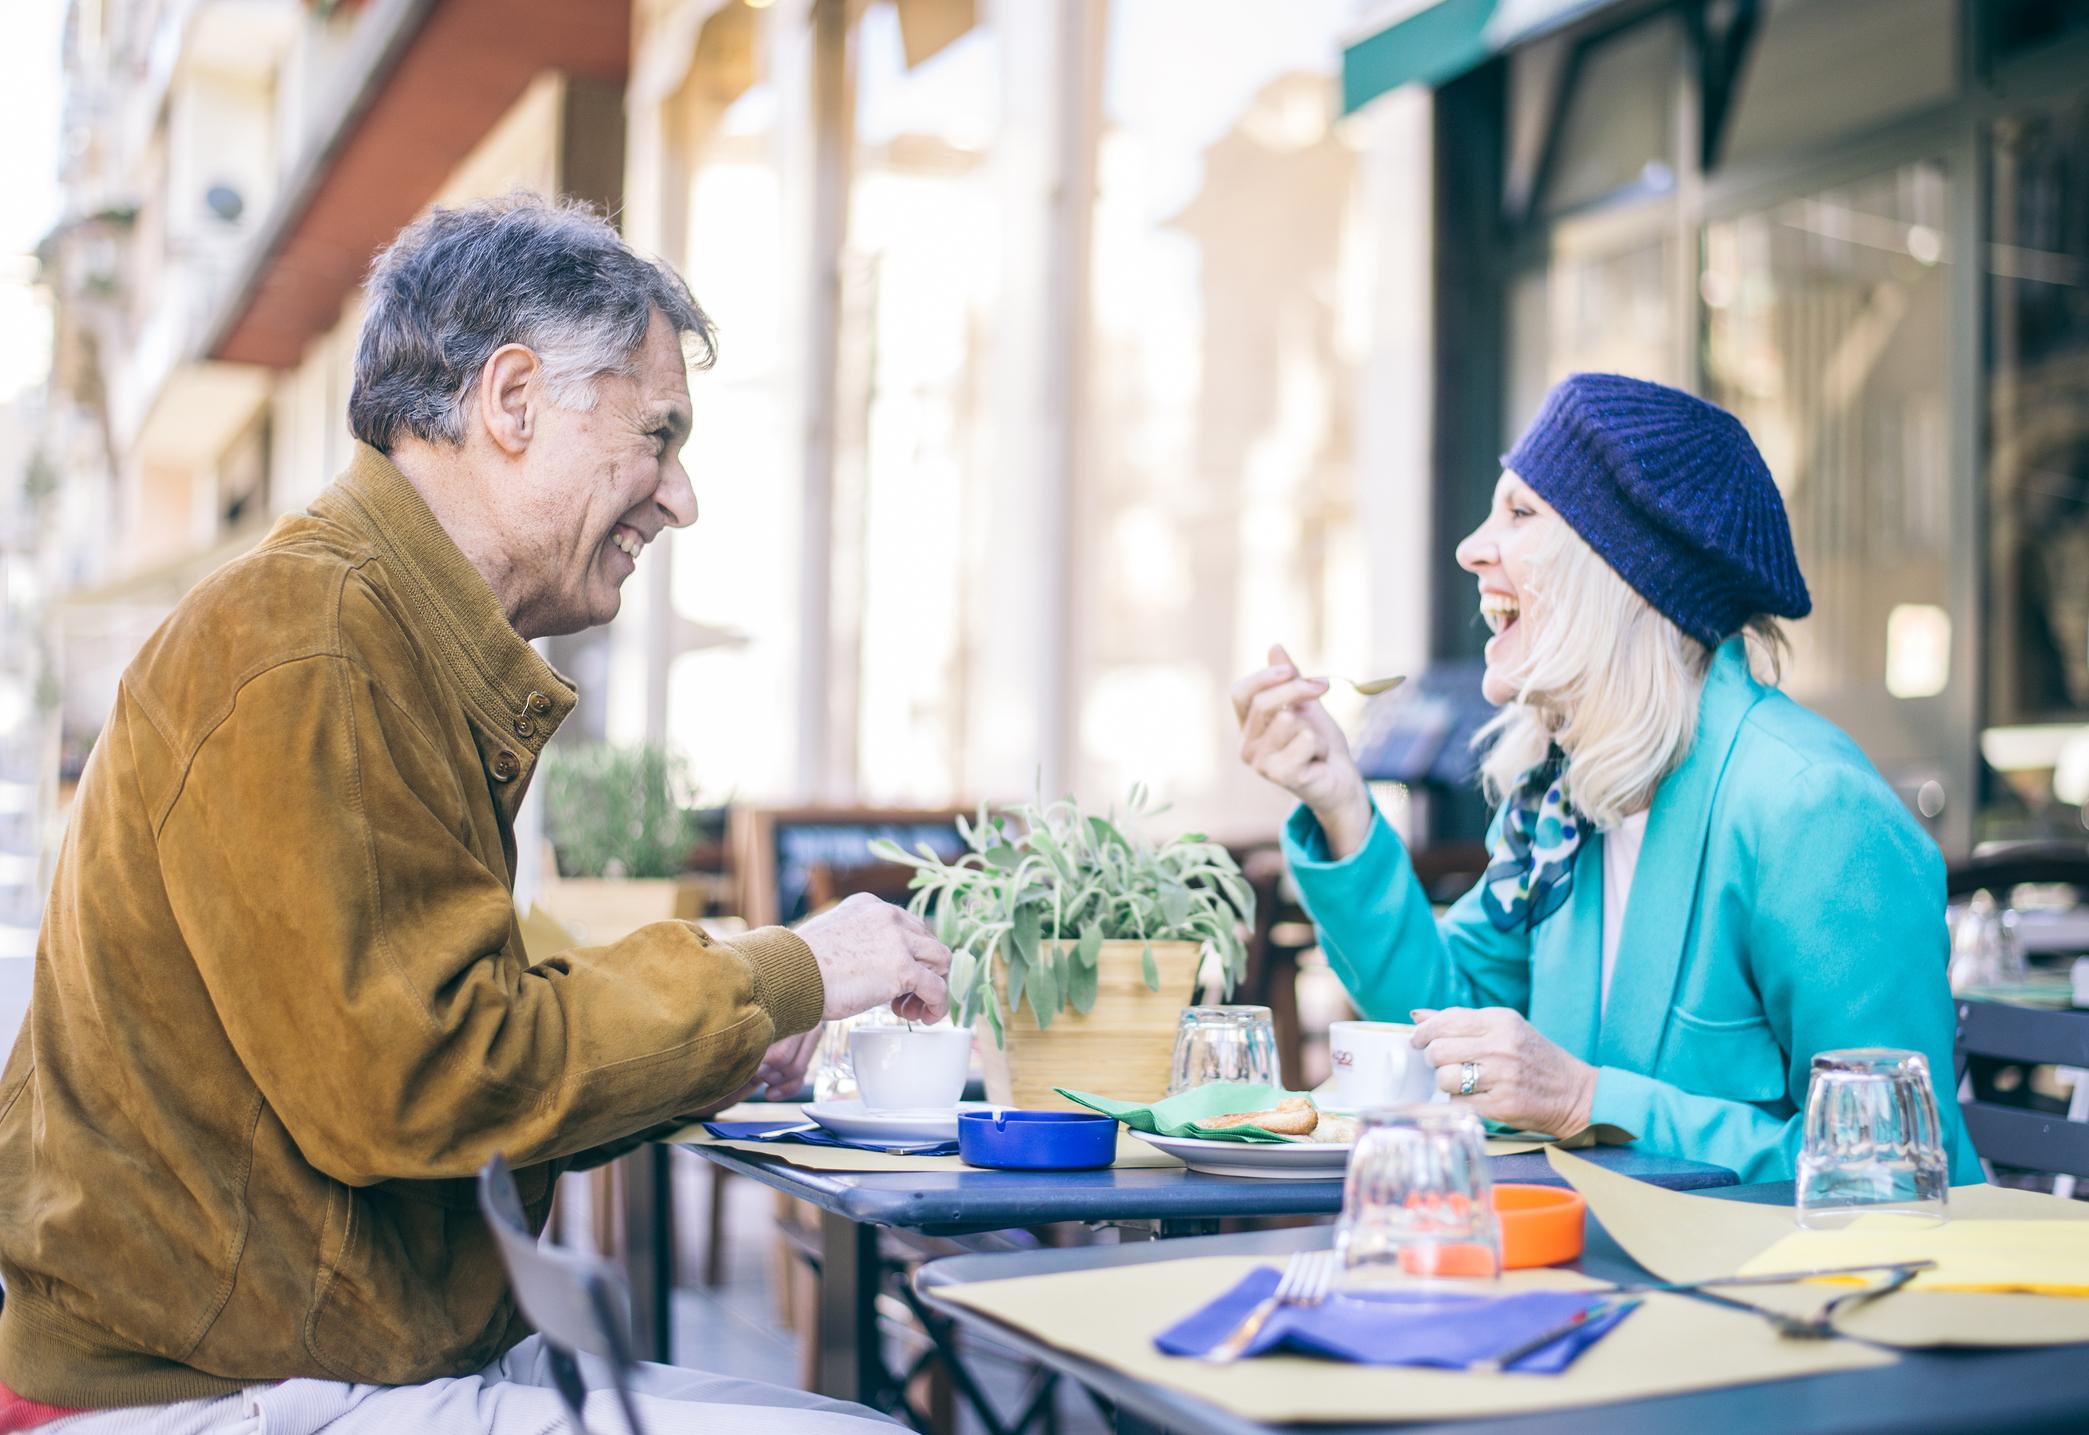 Do All Seniors Pay Taxes on Their Social Security Benefits? | The Motley Fool